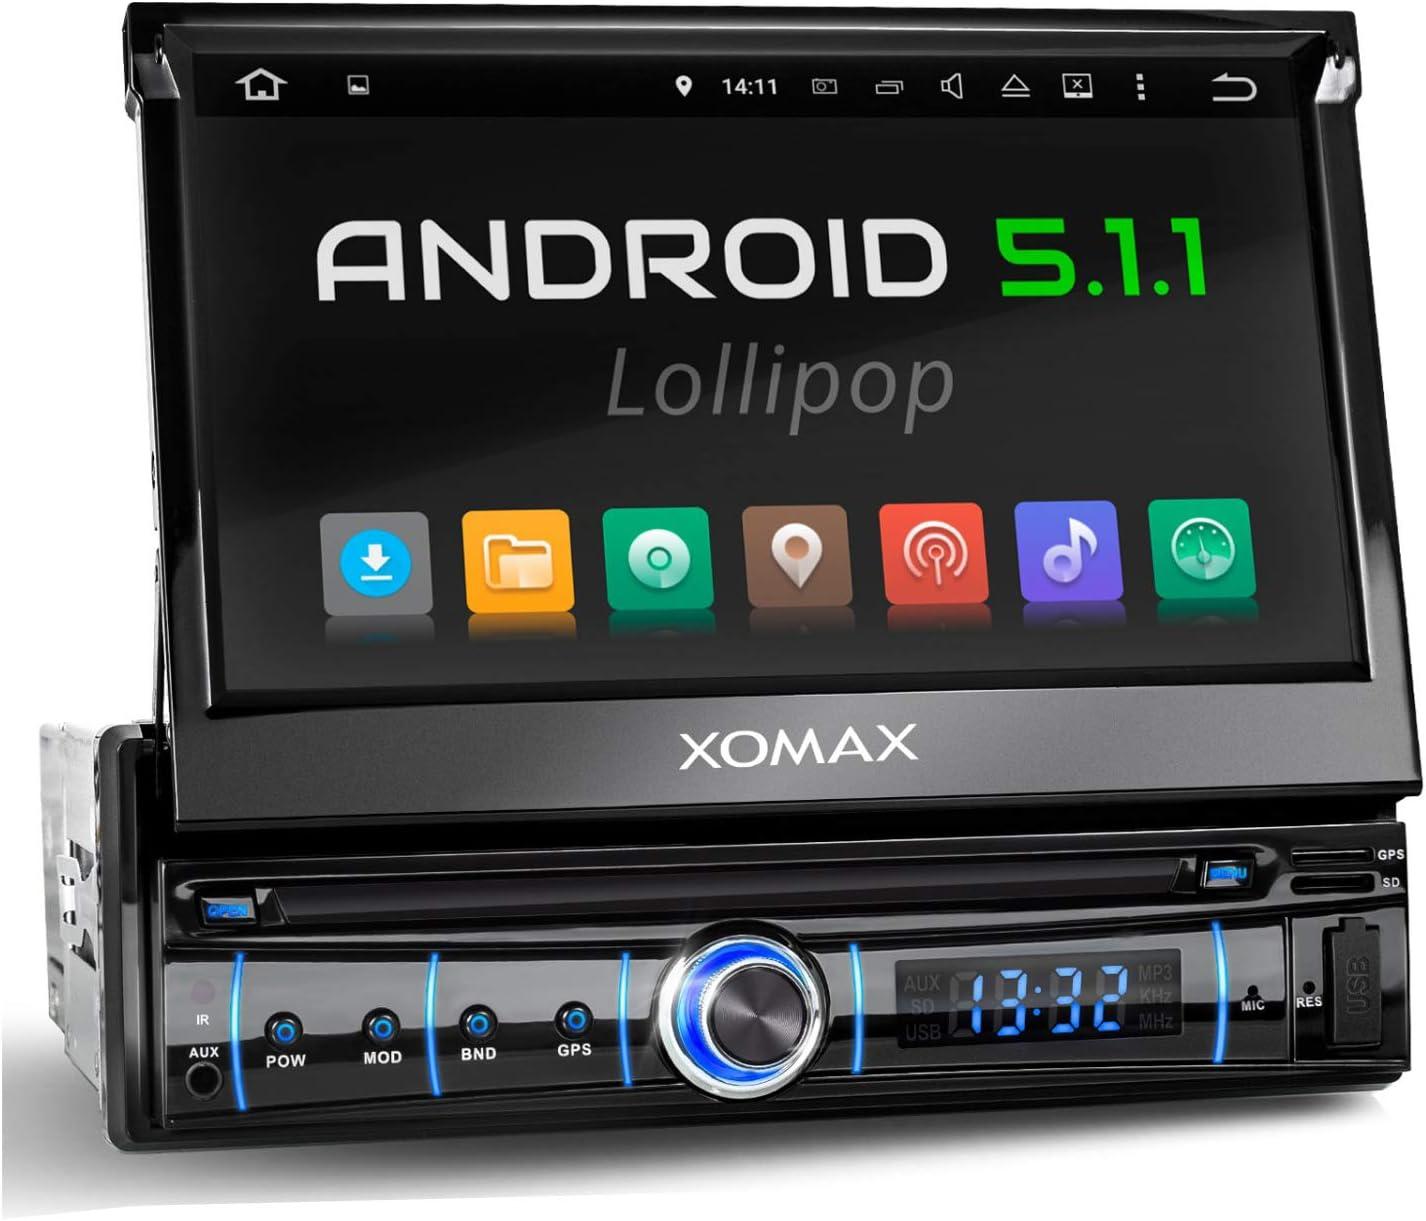 Xomax Xm Vrsua737 Autoradio Mit Android 5 1 16gb Gps Navigation Wifi Wlan Odb2 Mirrorlink Bluetooth Freisprecheinrichtung 7 Zoll 18 Cm Touchscreen Bildschirm Usb Micro Sd 1 Din Elektronik